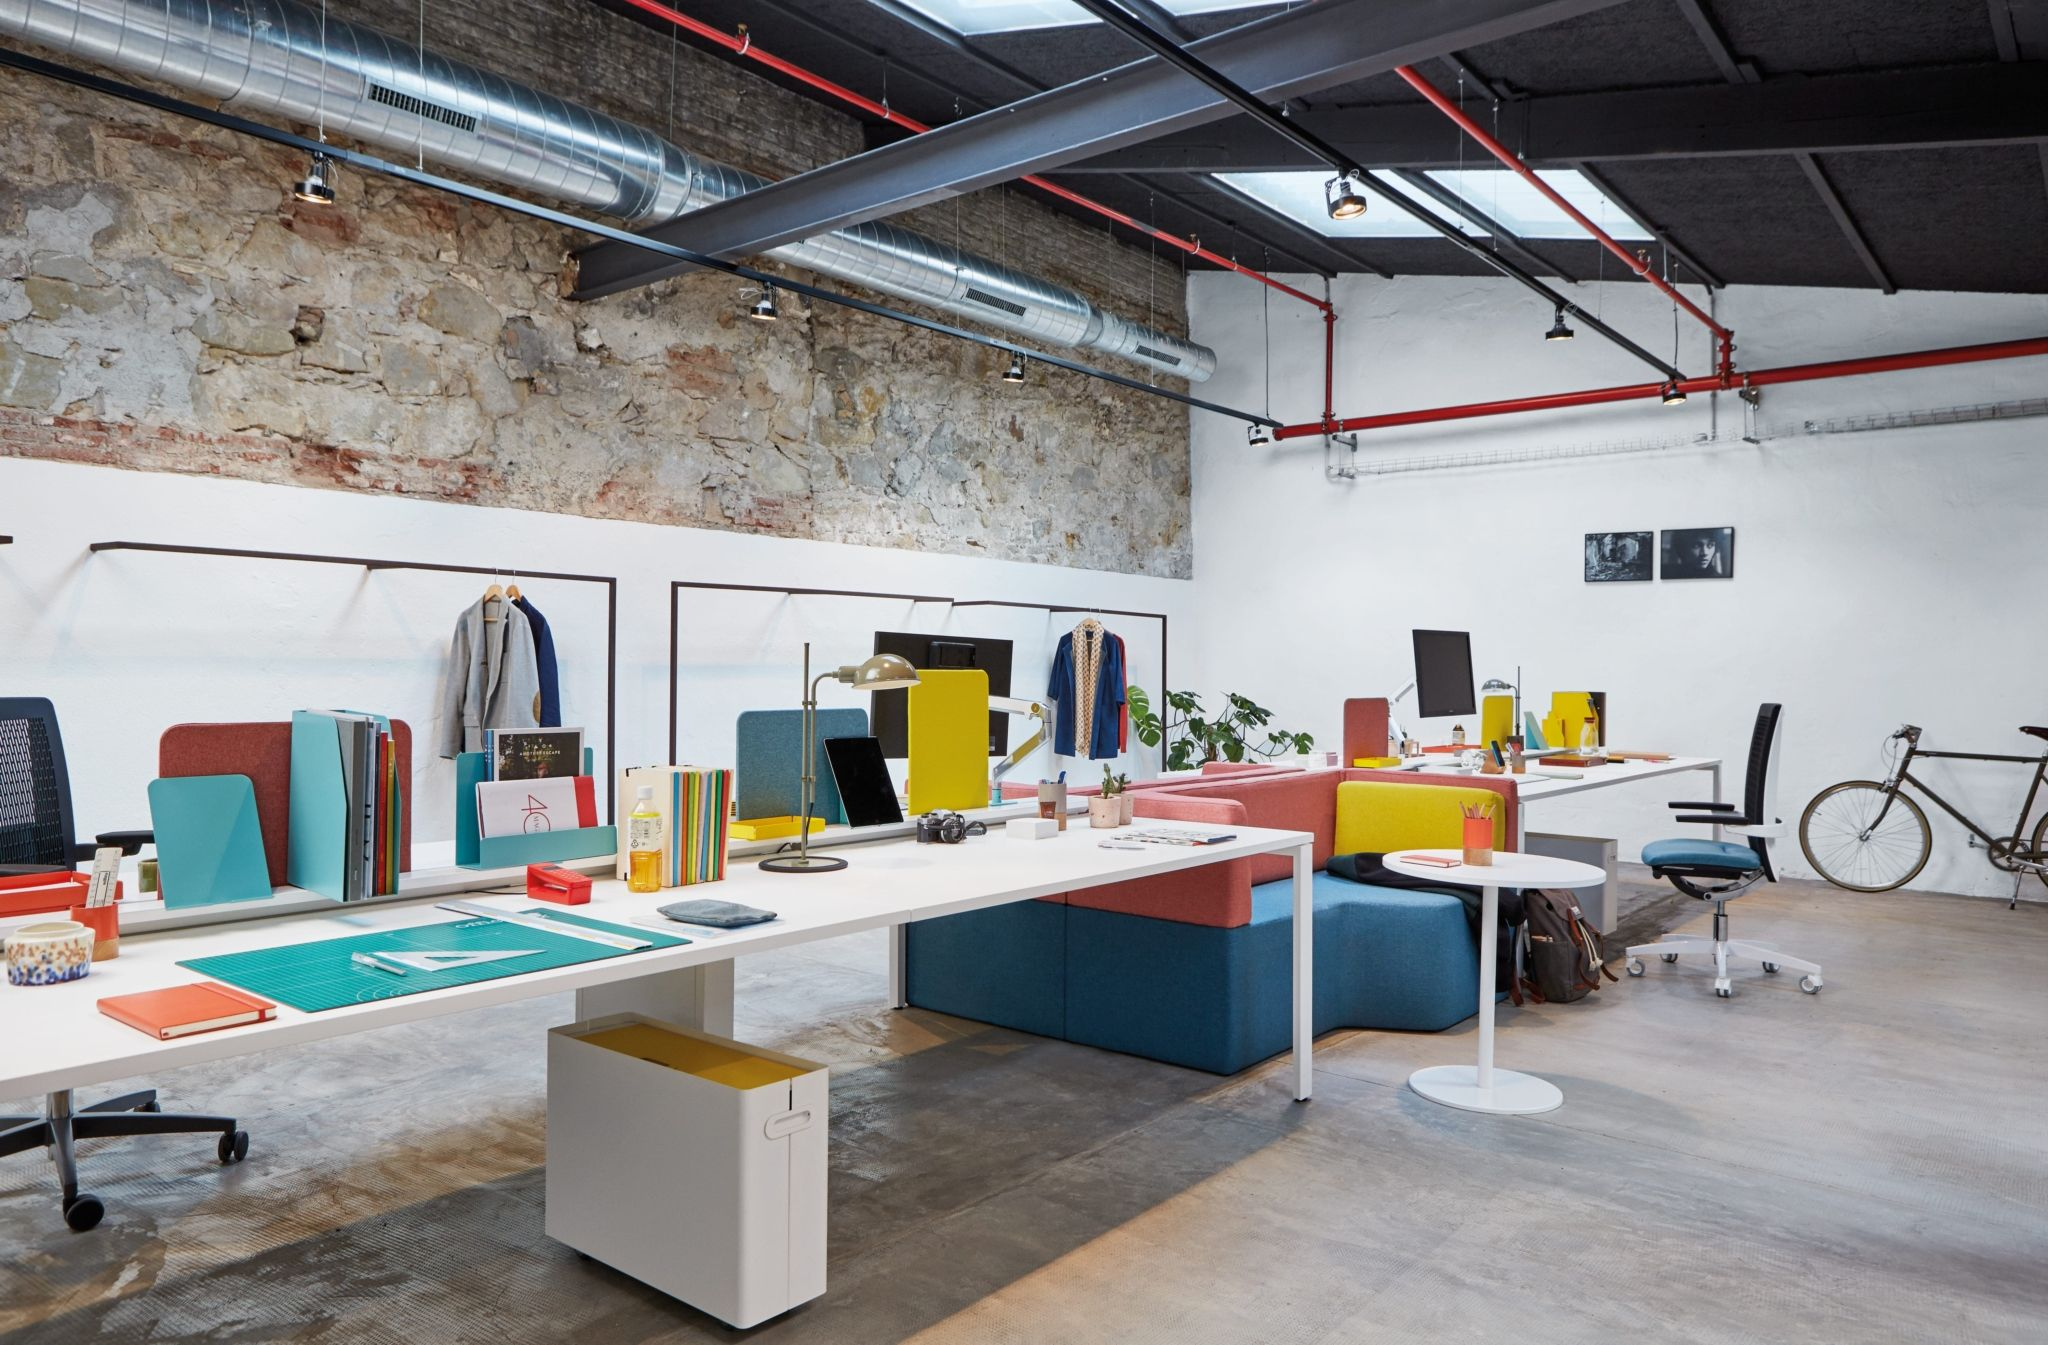 Fabricants de mobilier de bureau design en espagne ofita